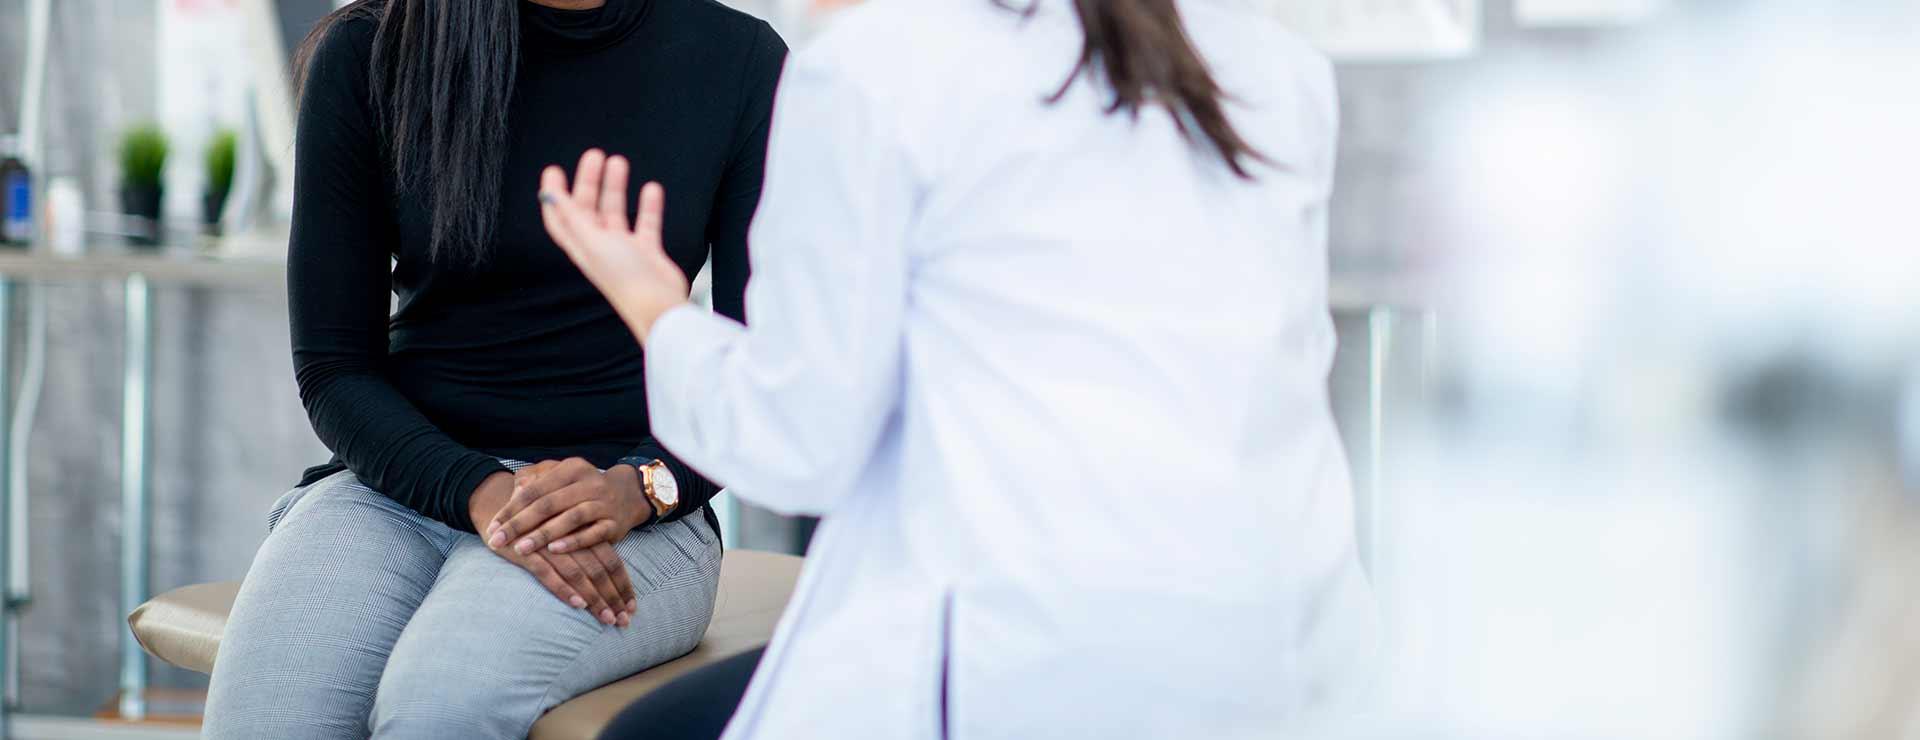 GARDASIL 9 SUSP. INJ. IN SERINGA PREUMPLUTA — Lista Medicamentelor Mediately